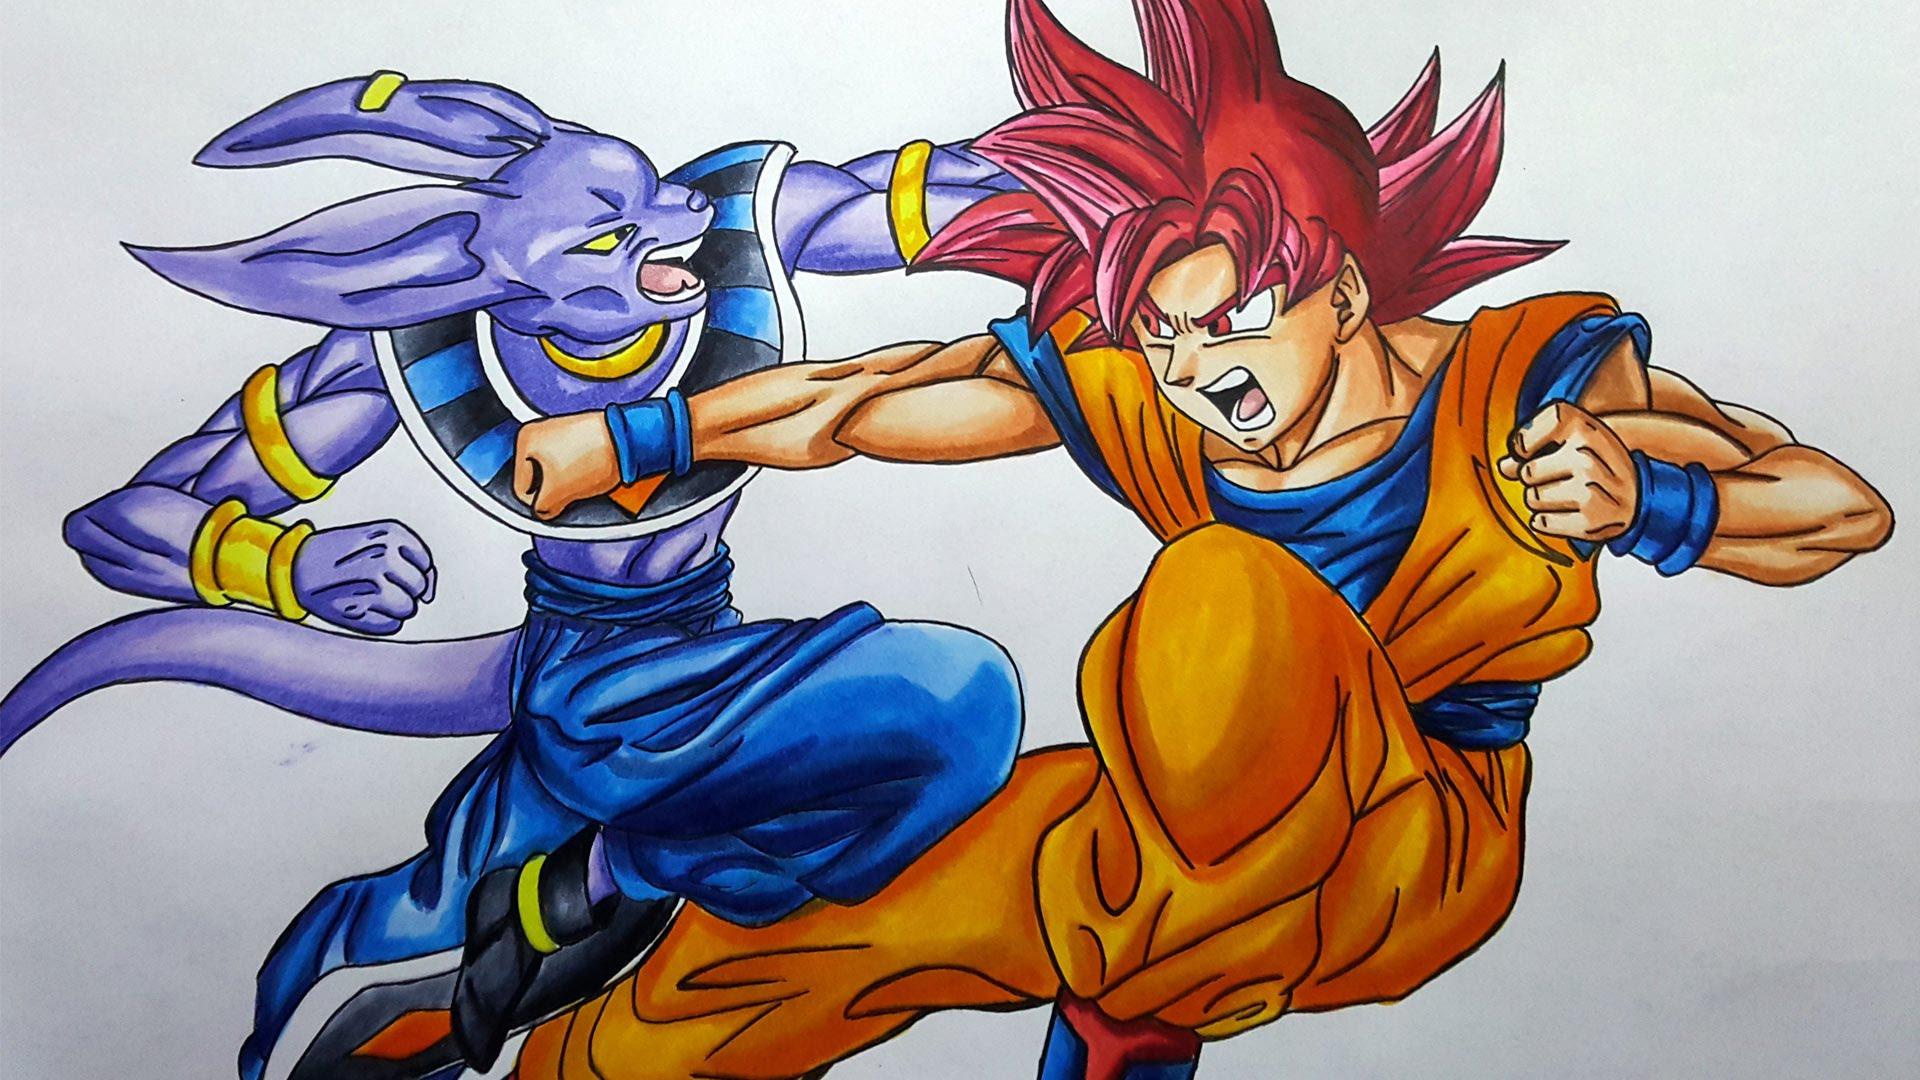 1920x1080 Drawing Beerus Vs Super Saiyan God Goku Dragonball